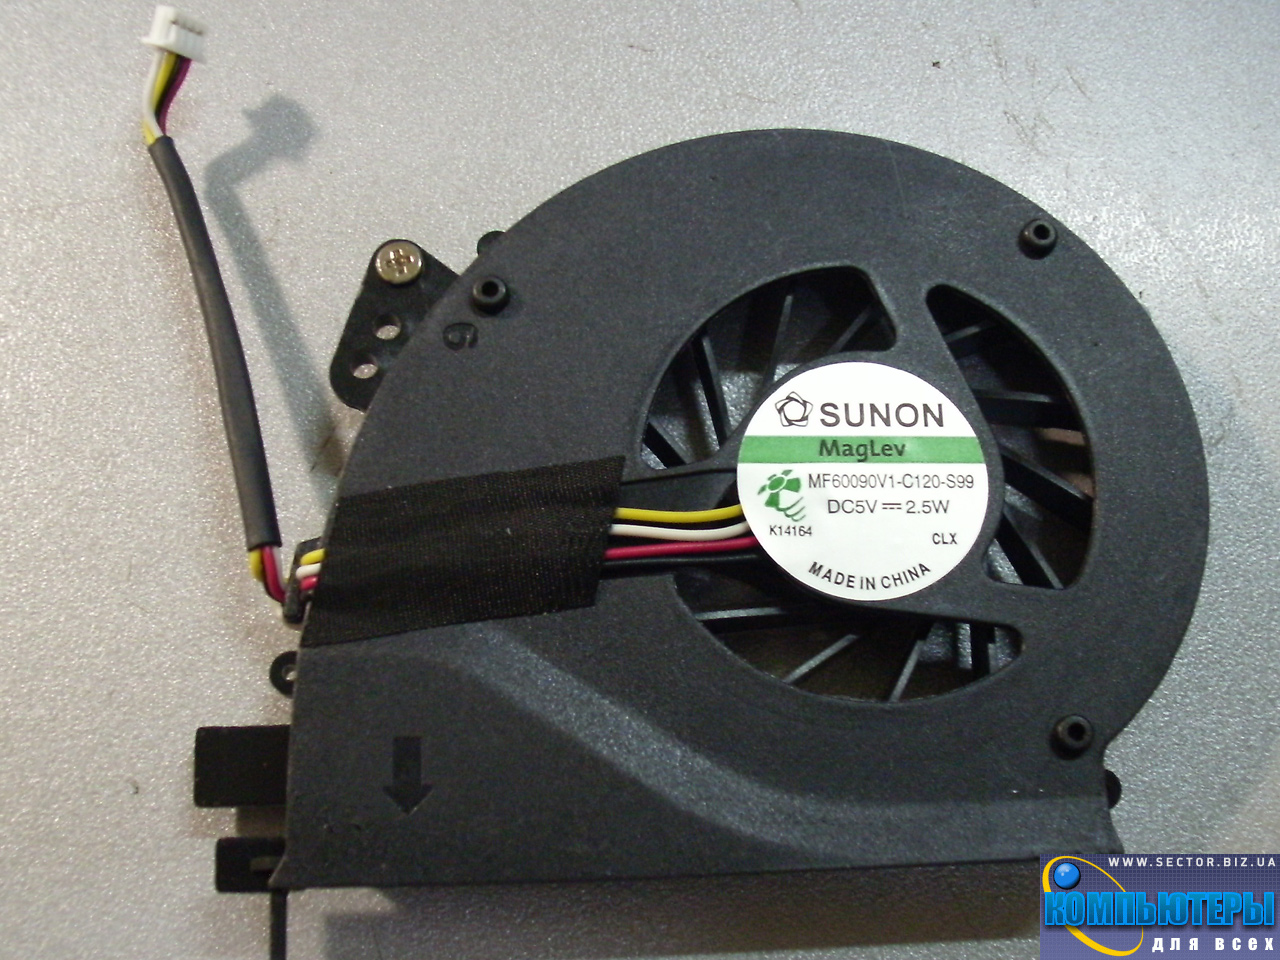 Кулер к ноутбуку Acer Extensa 5235 5635 5635G 5635Z 5635ZG ZR6 p/n: MF60090V1-C120-S99. Фото № 3.